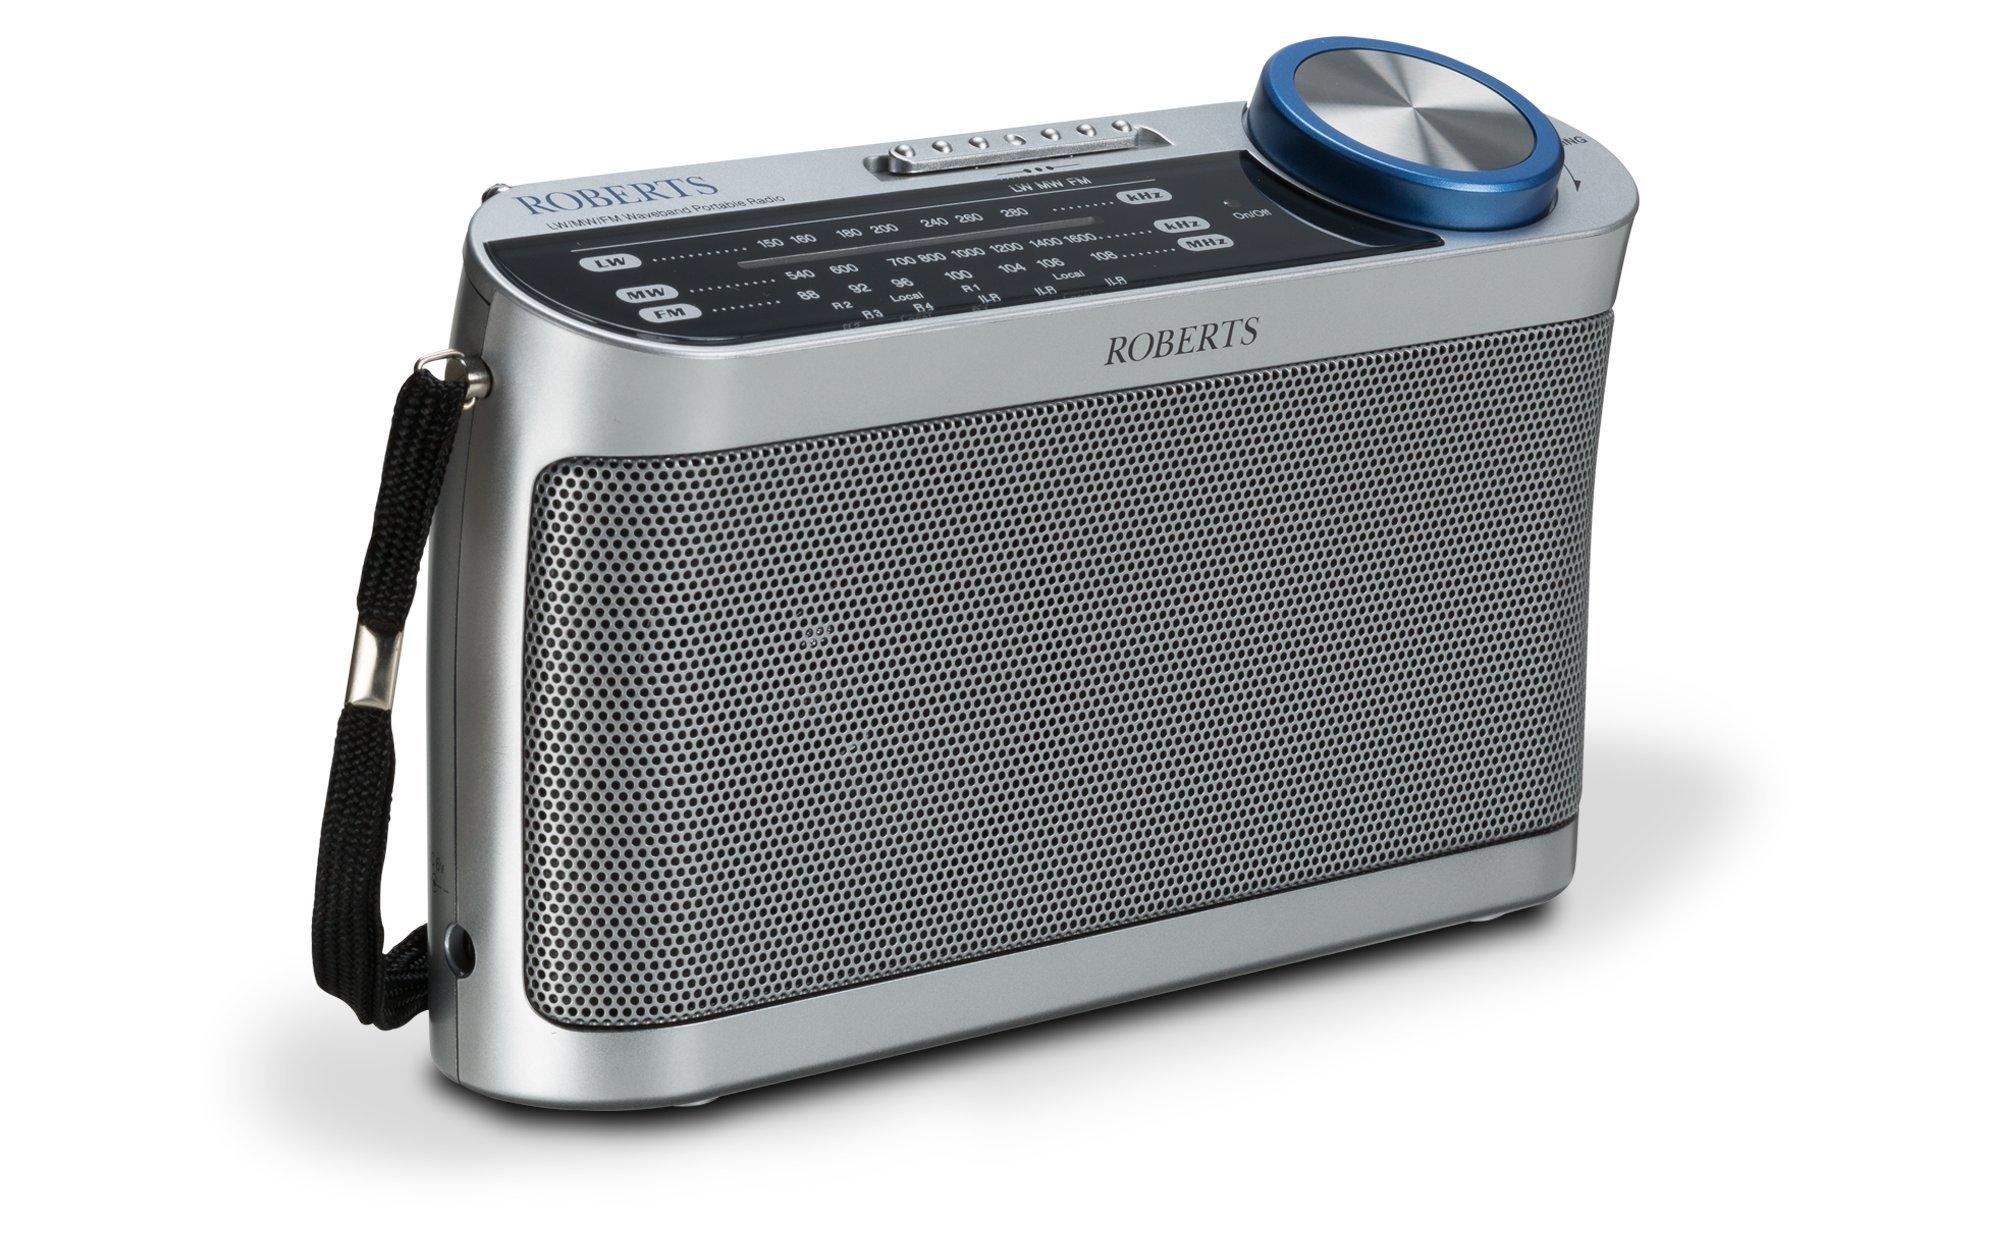 Roberts Radio R9993 Portable LW/MW/FM Radio with Headphone Socket 2